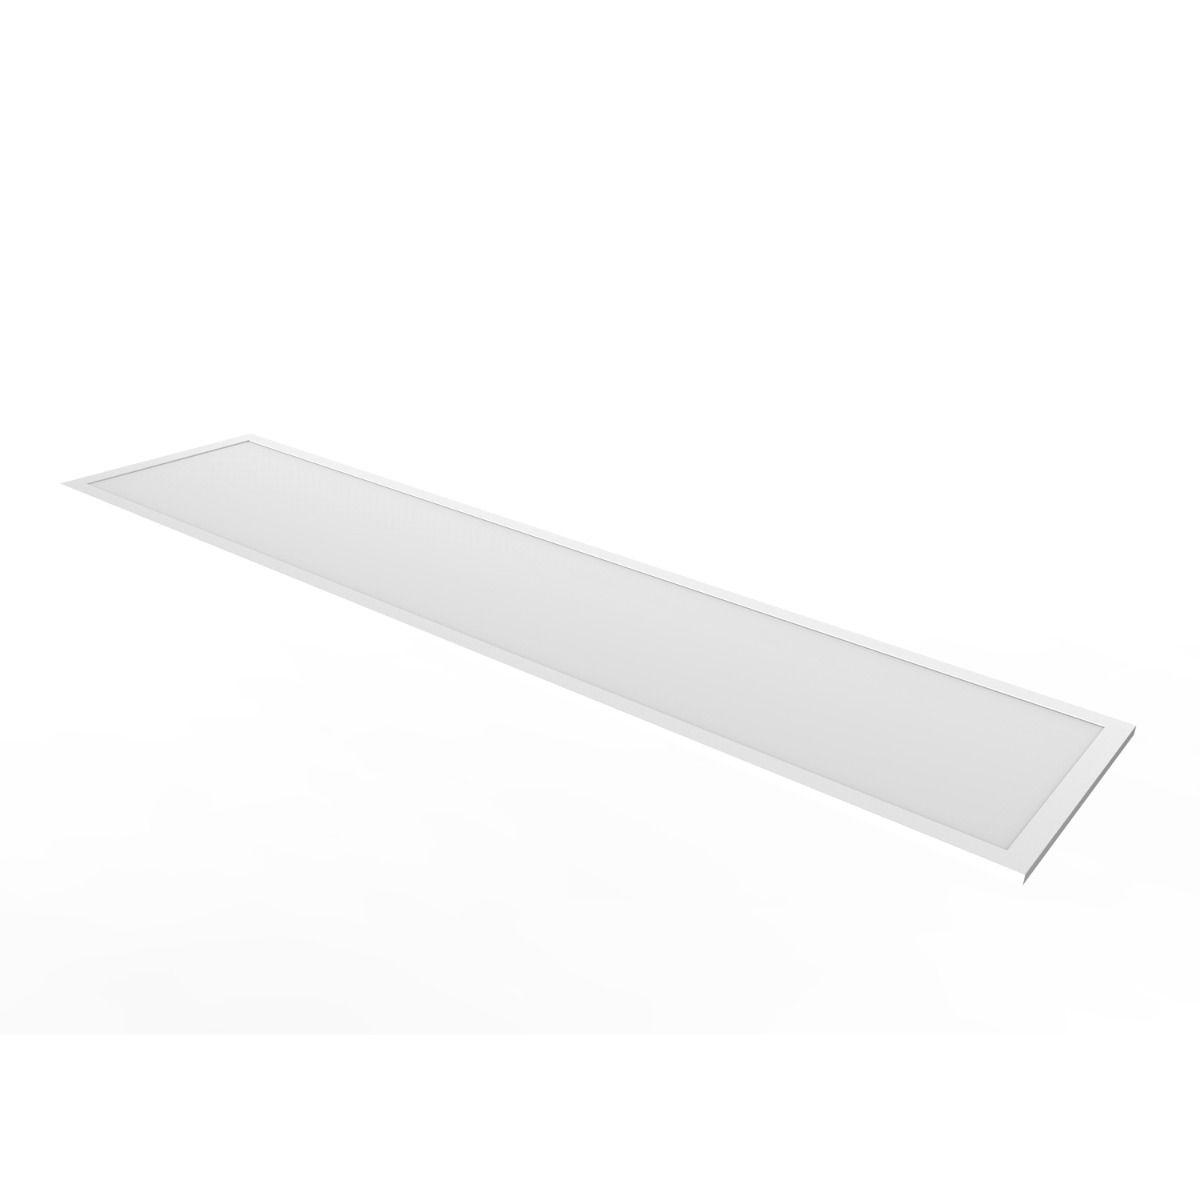 Noxion Panel LED Ecowhite V2.0 30x120cm 3000K 36W UGR <19 | Luz Cálida - Reemplazo 2x36W